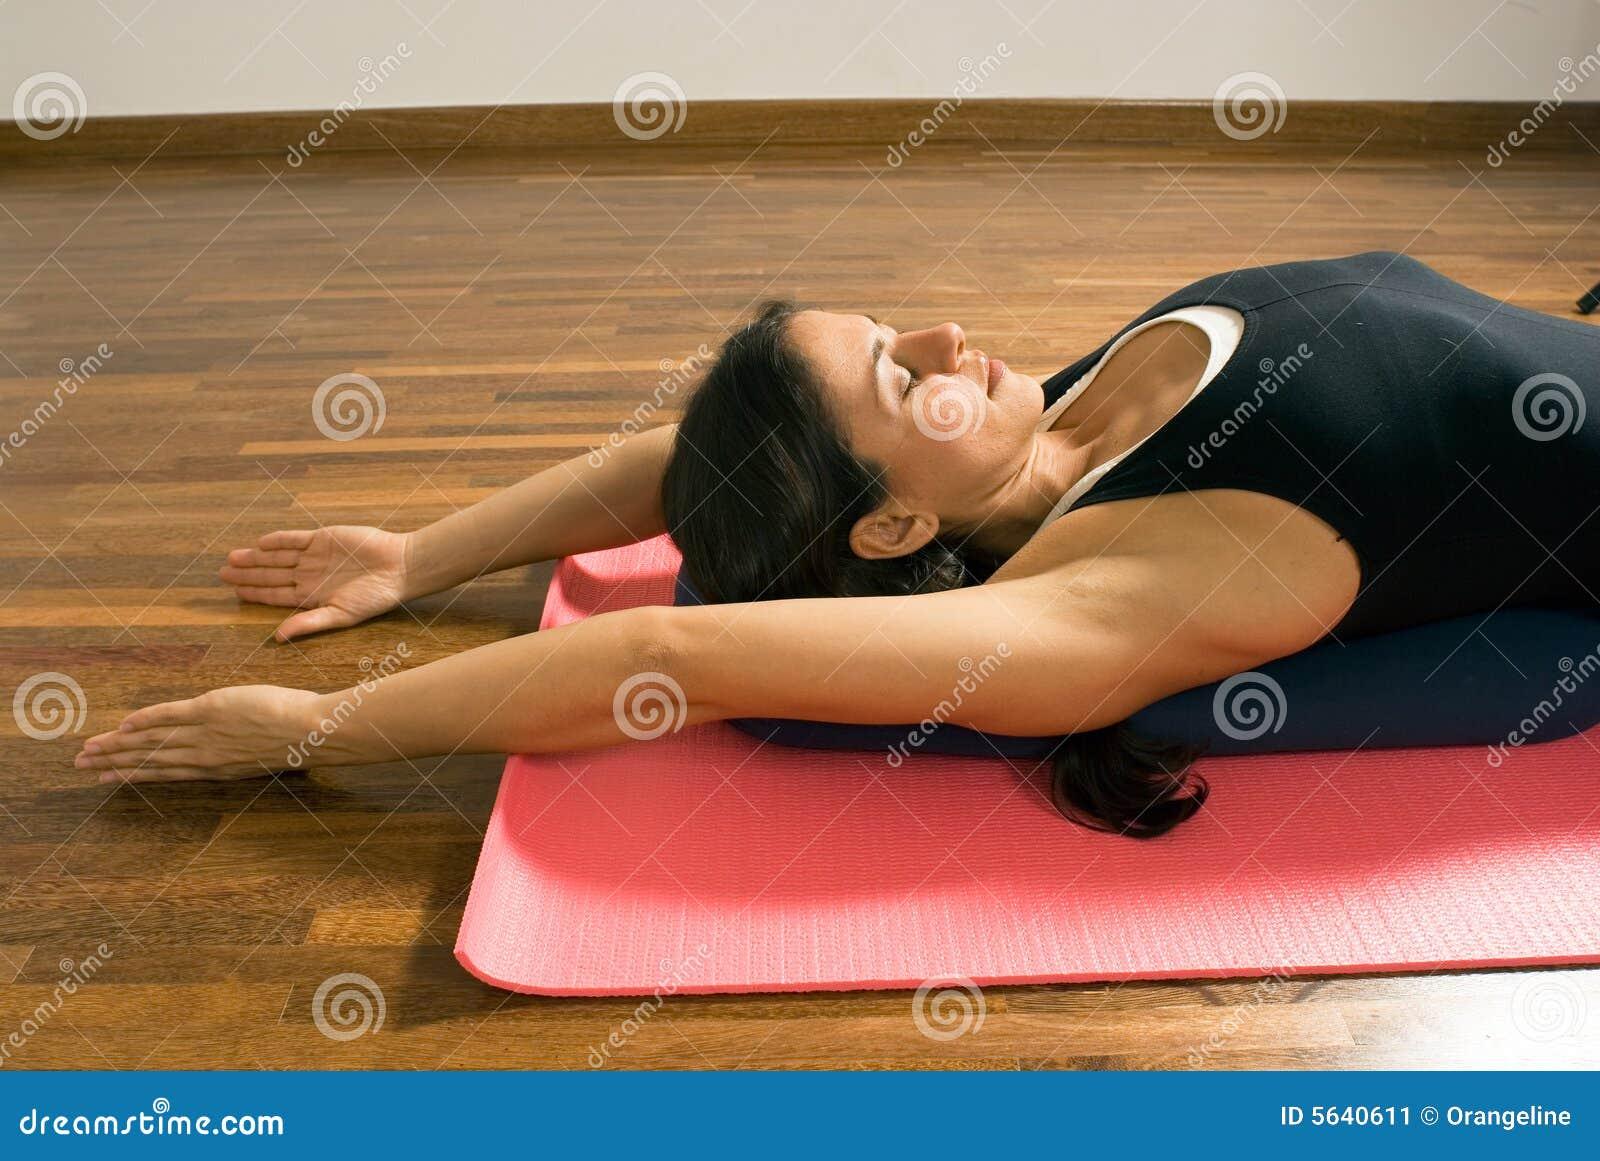 Woman Lying On Yoga Mat Horizontal Stock Image Image